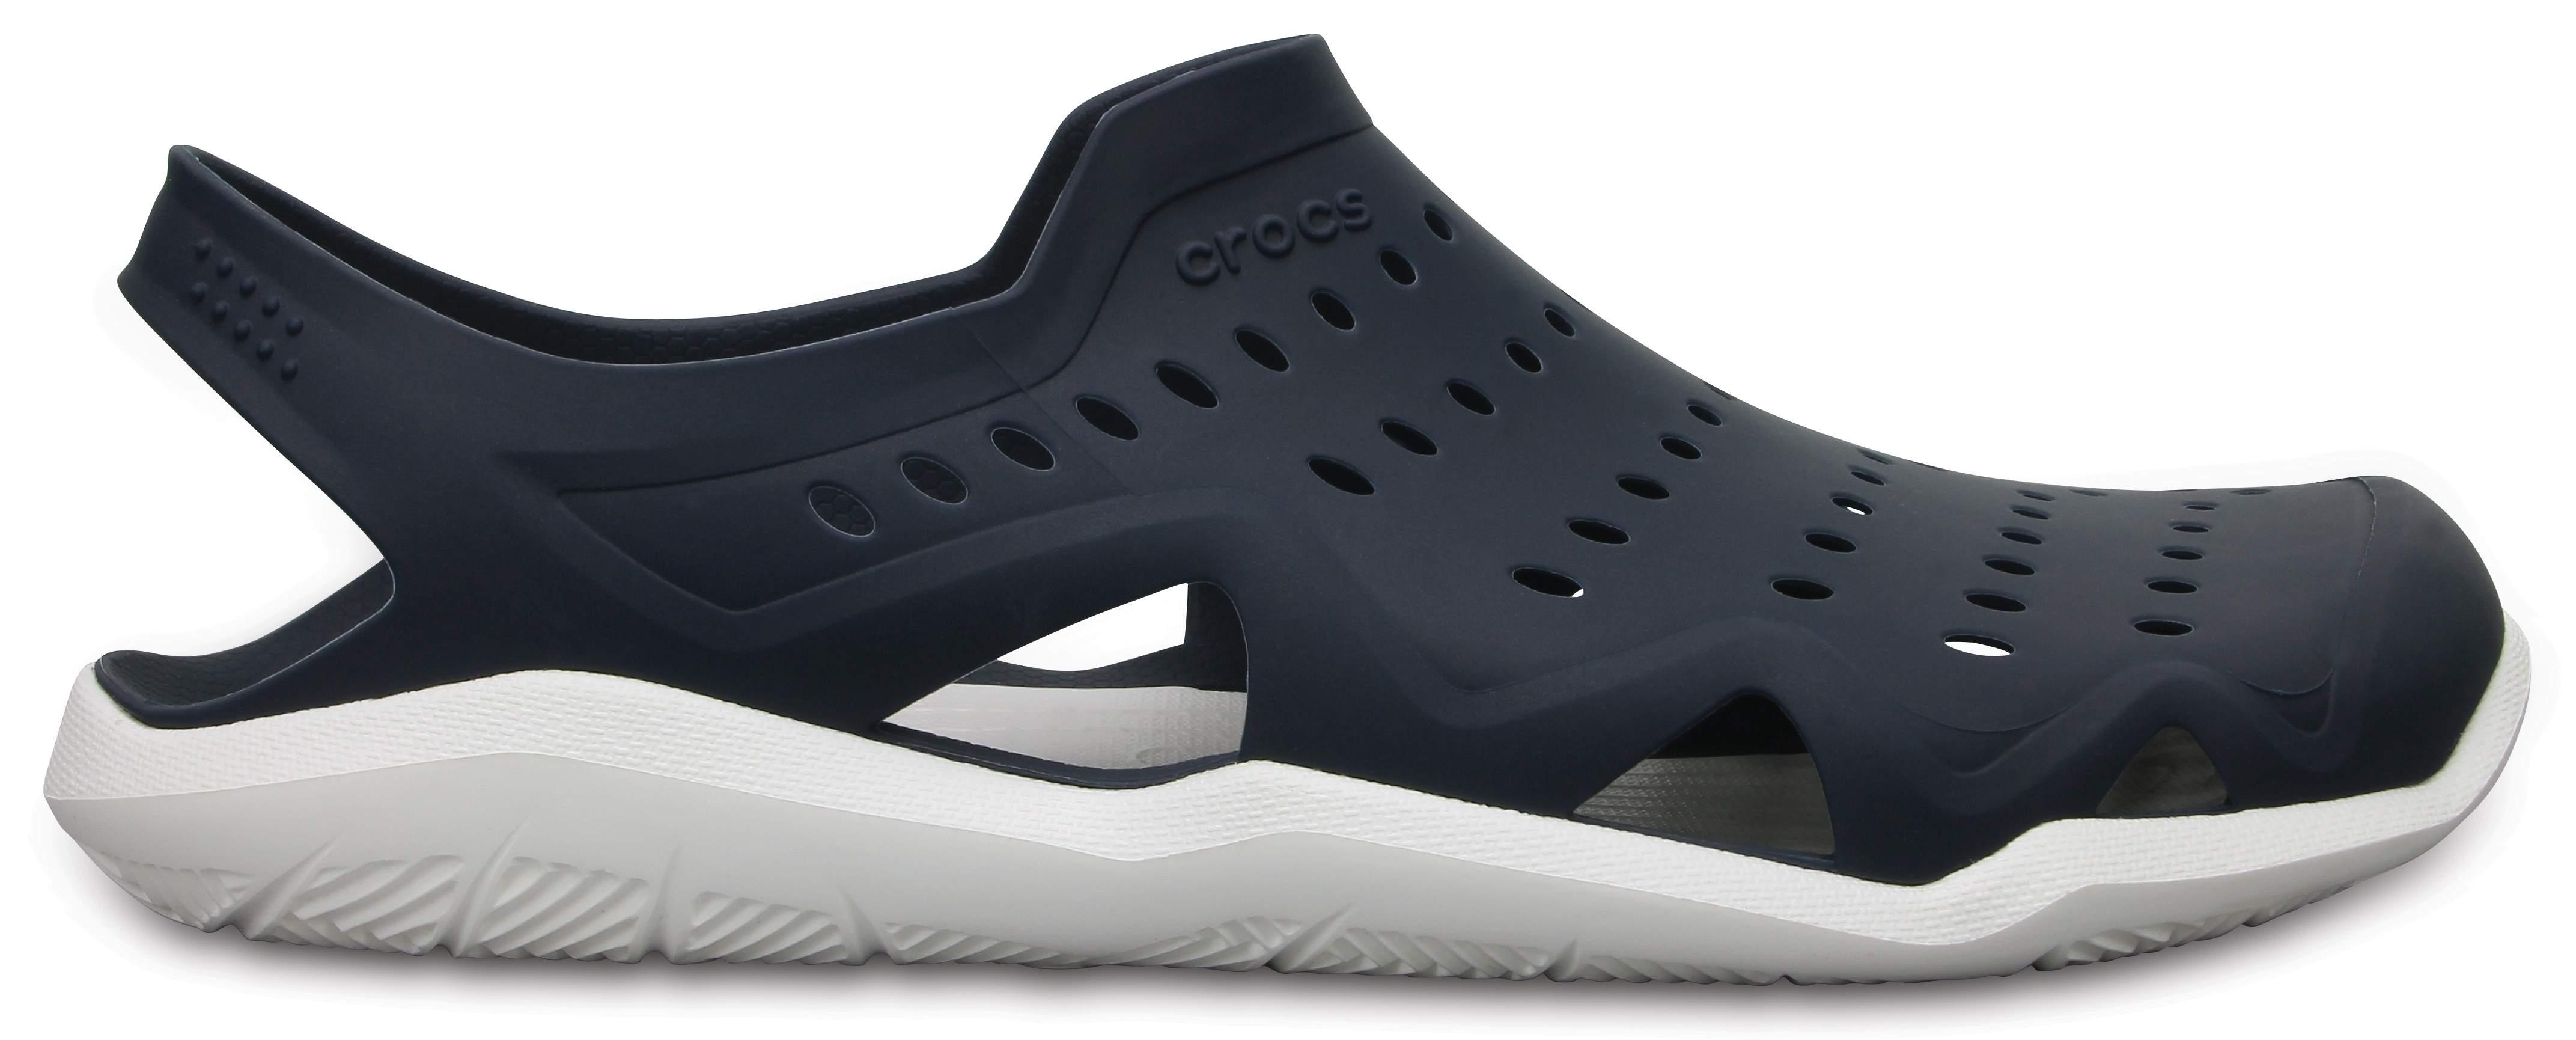 Crocs Mens Swiftwater Wave M Flat